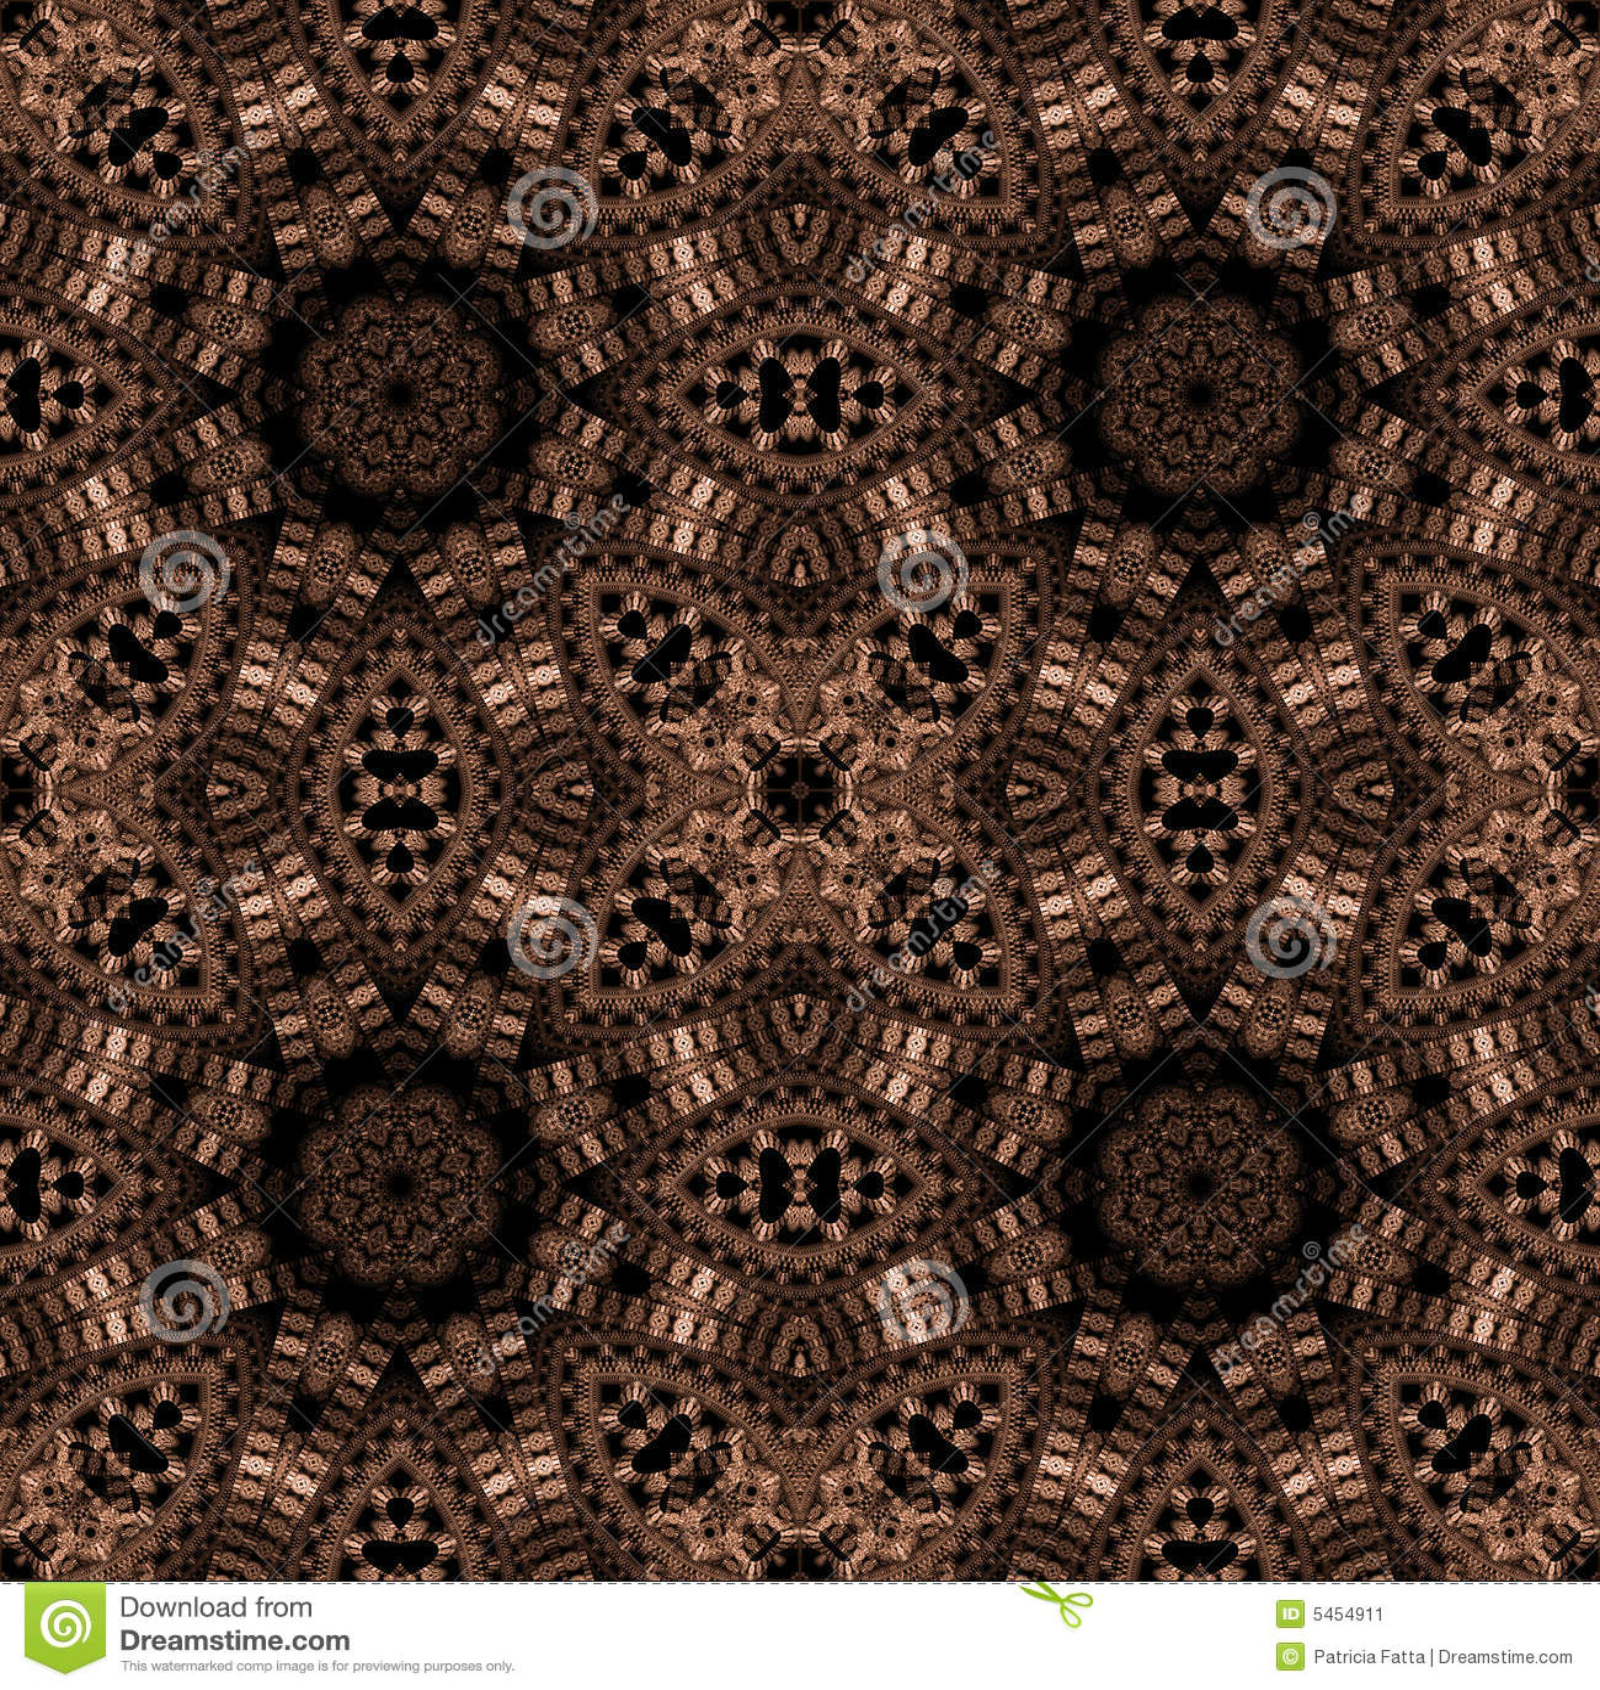 Abstract fractal image resembling elaborate filigree wallpaper.